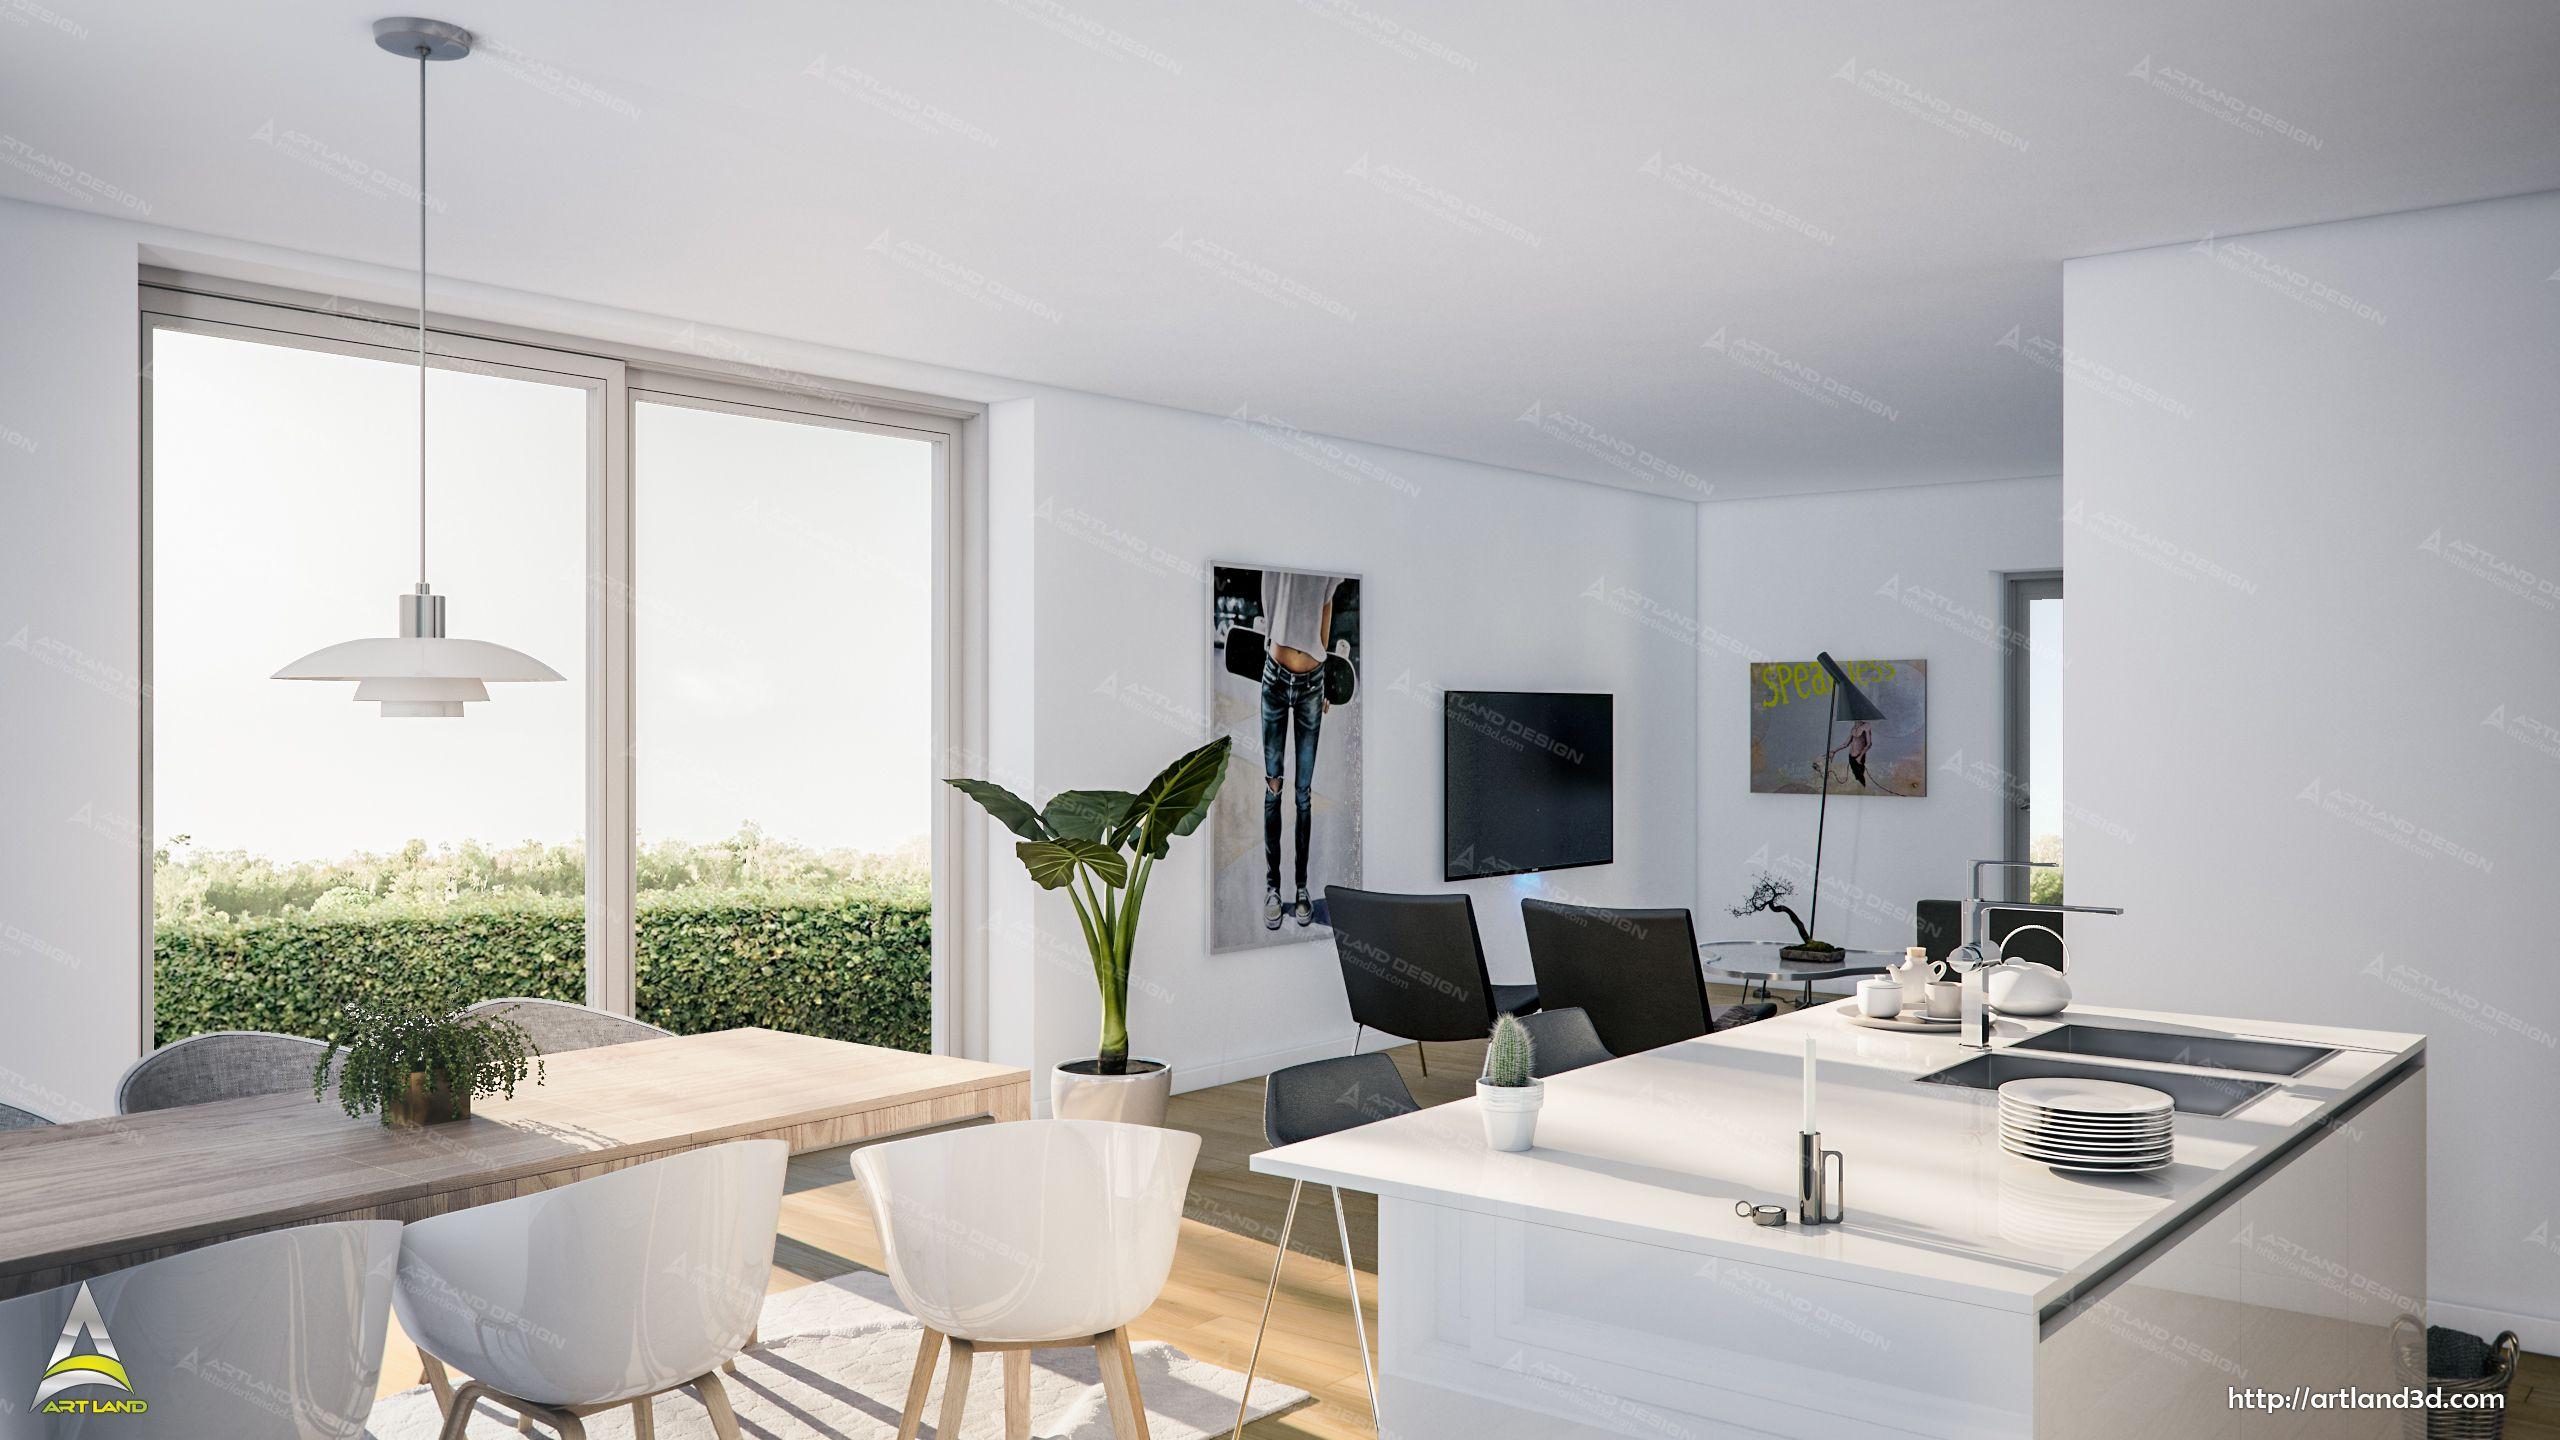 Apartment Interior Design Modern Living Room 3d Visualizaiton